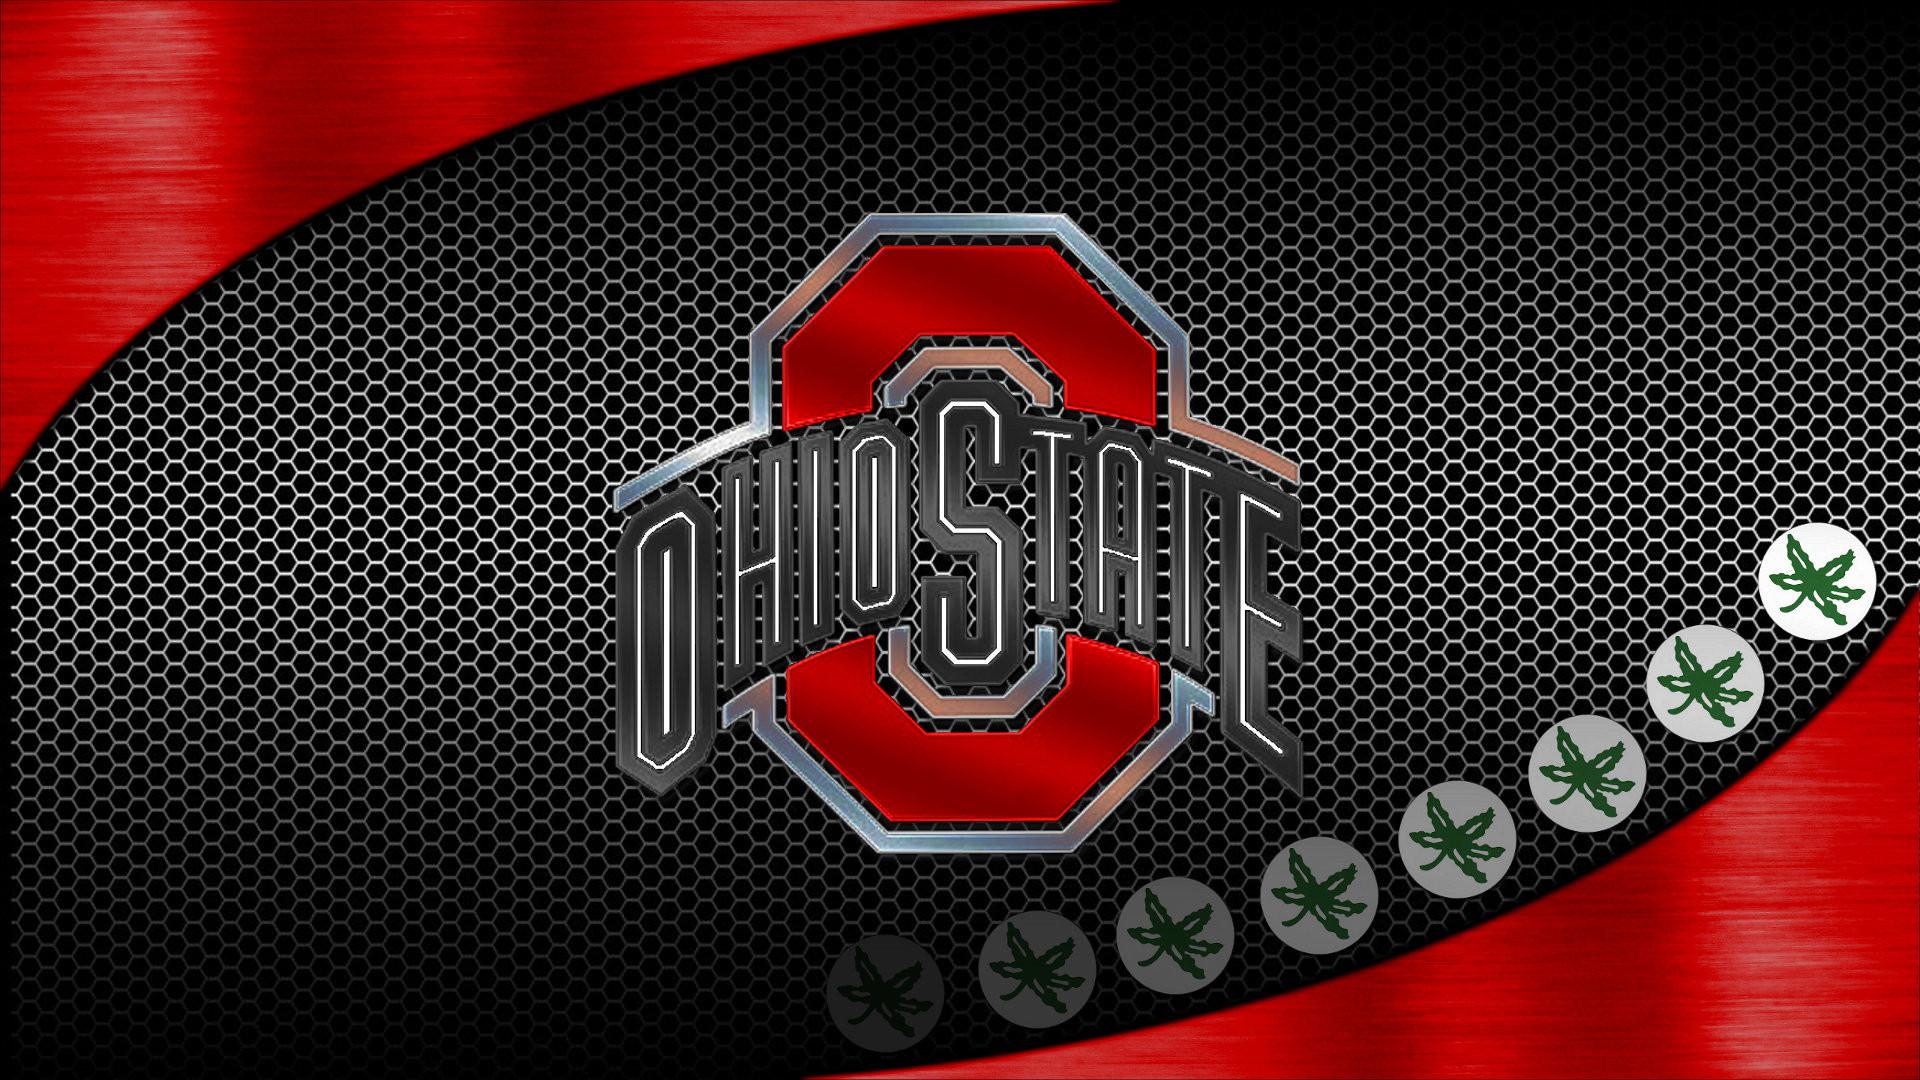 OSU Wallpaper 532